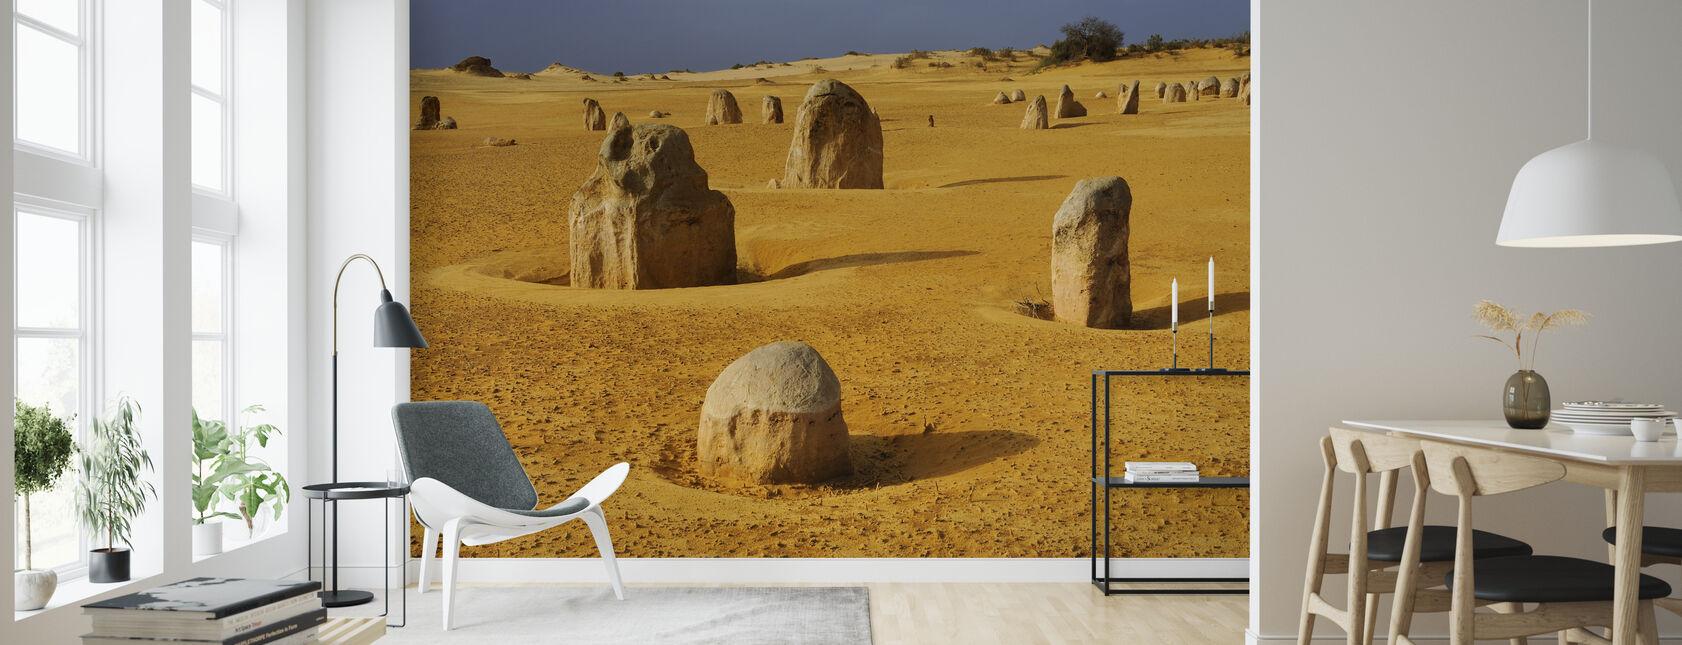 Limestone Formations - Wallpaper - Living Room